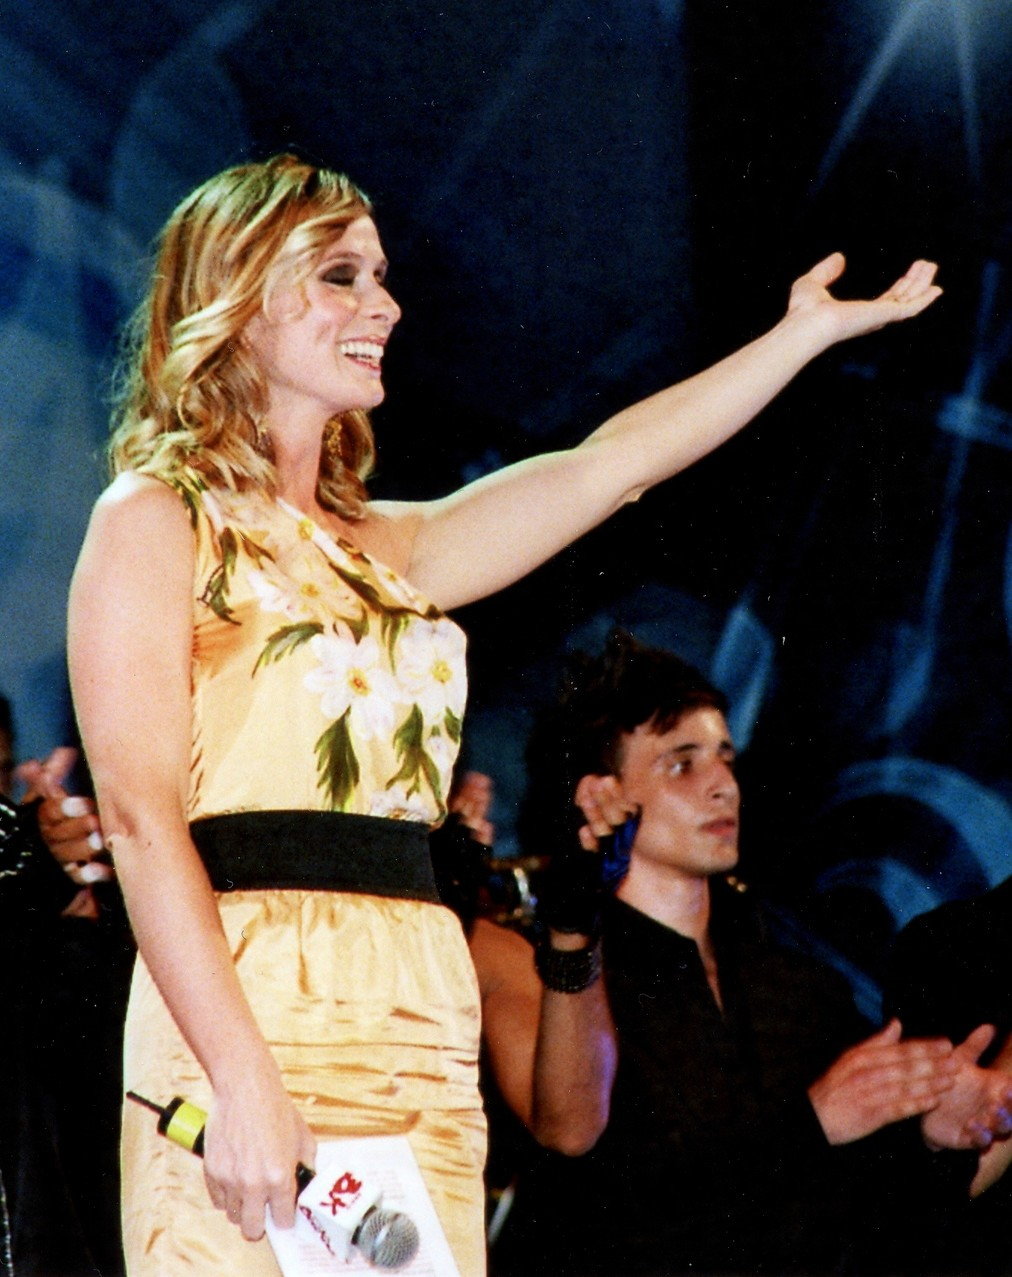 Serena Autieri (born 1976)